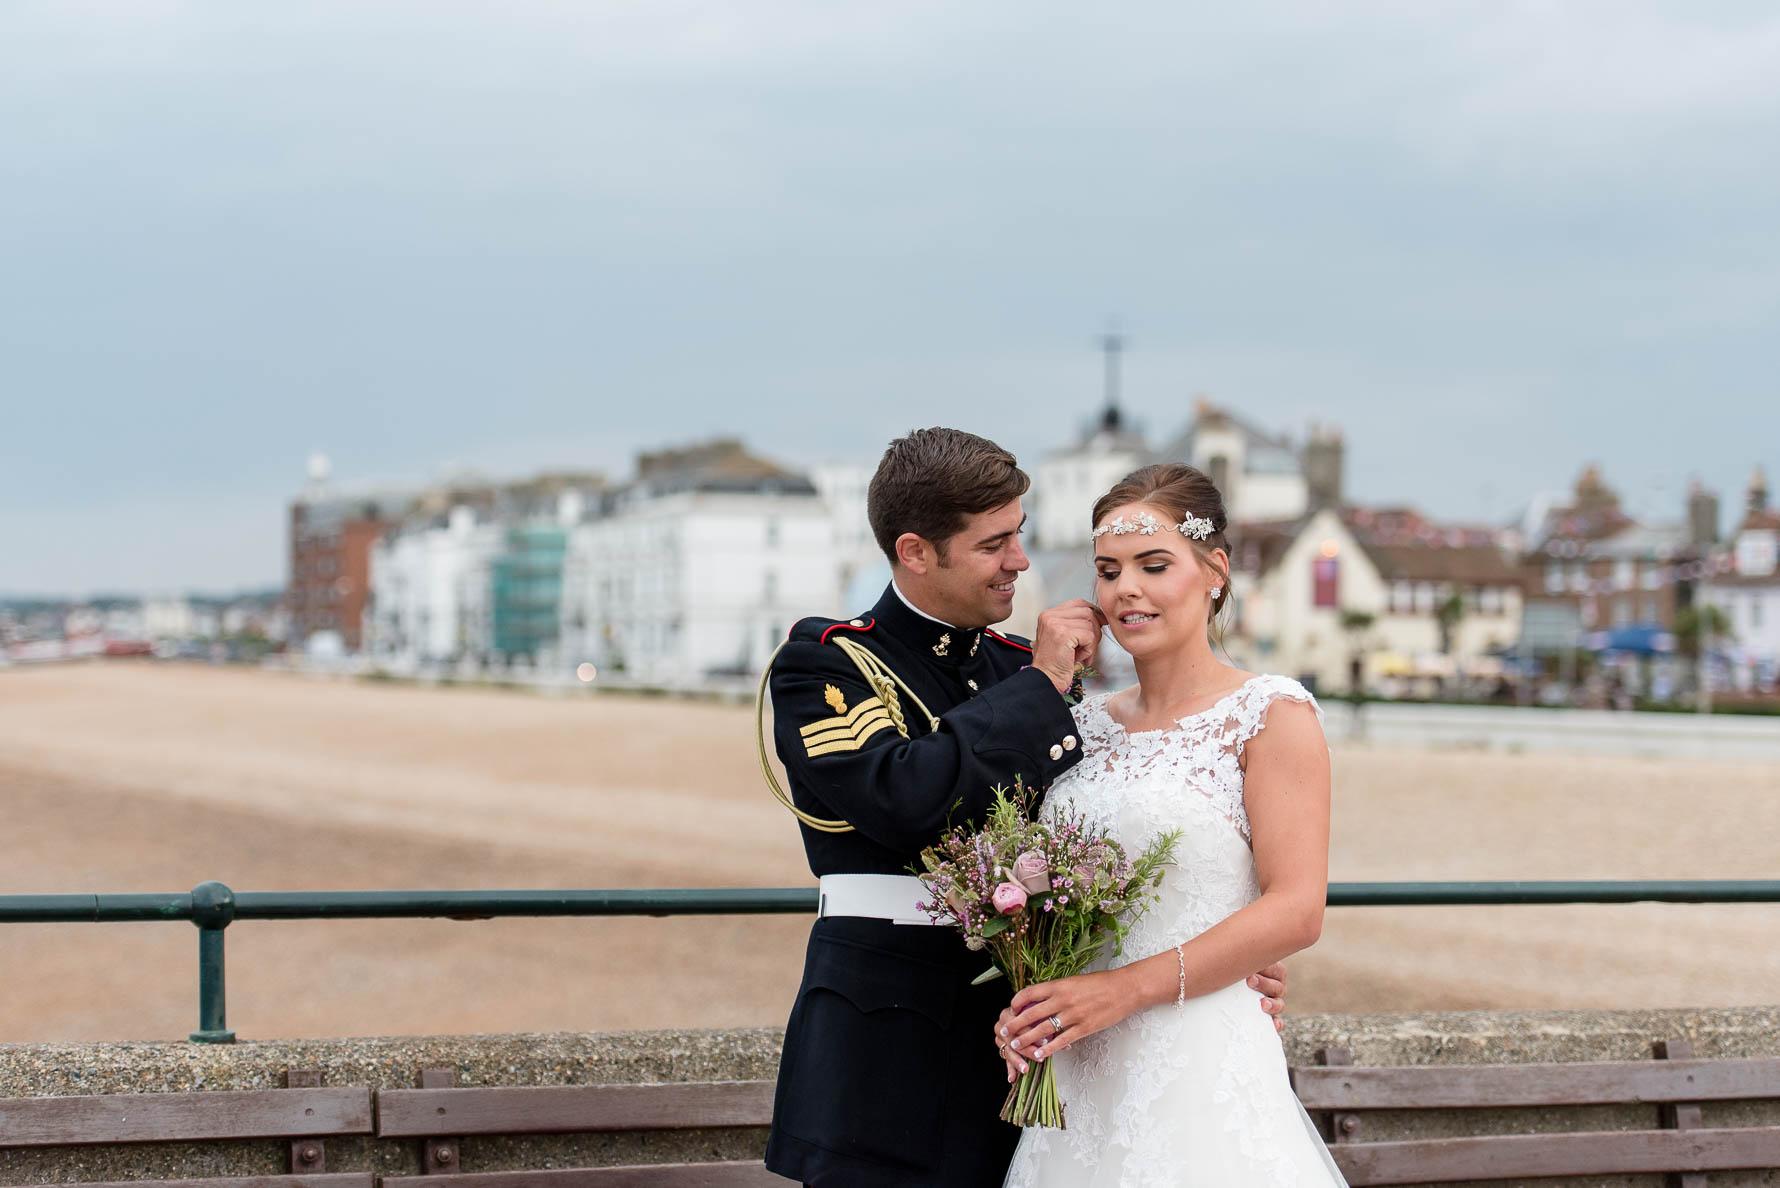 Wedding in Deal-7.jpg